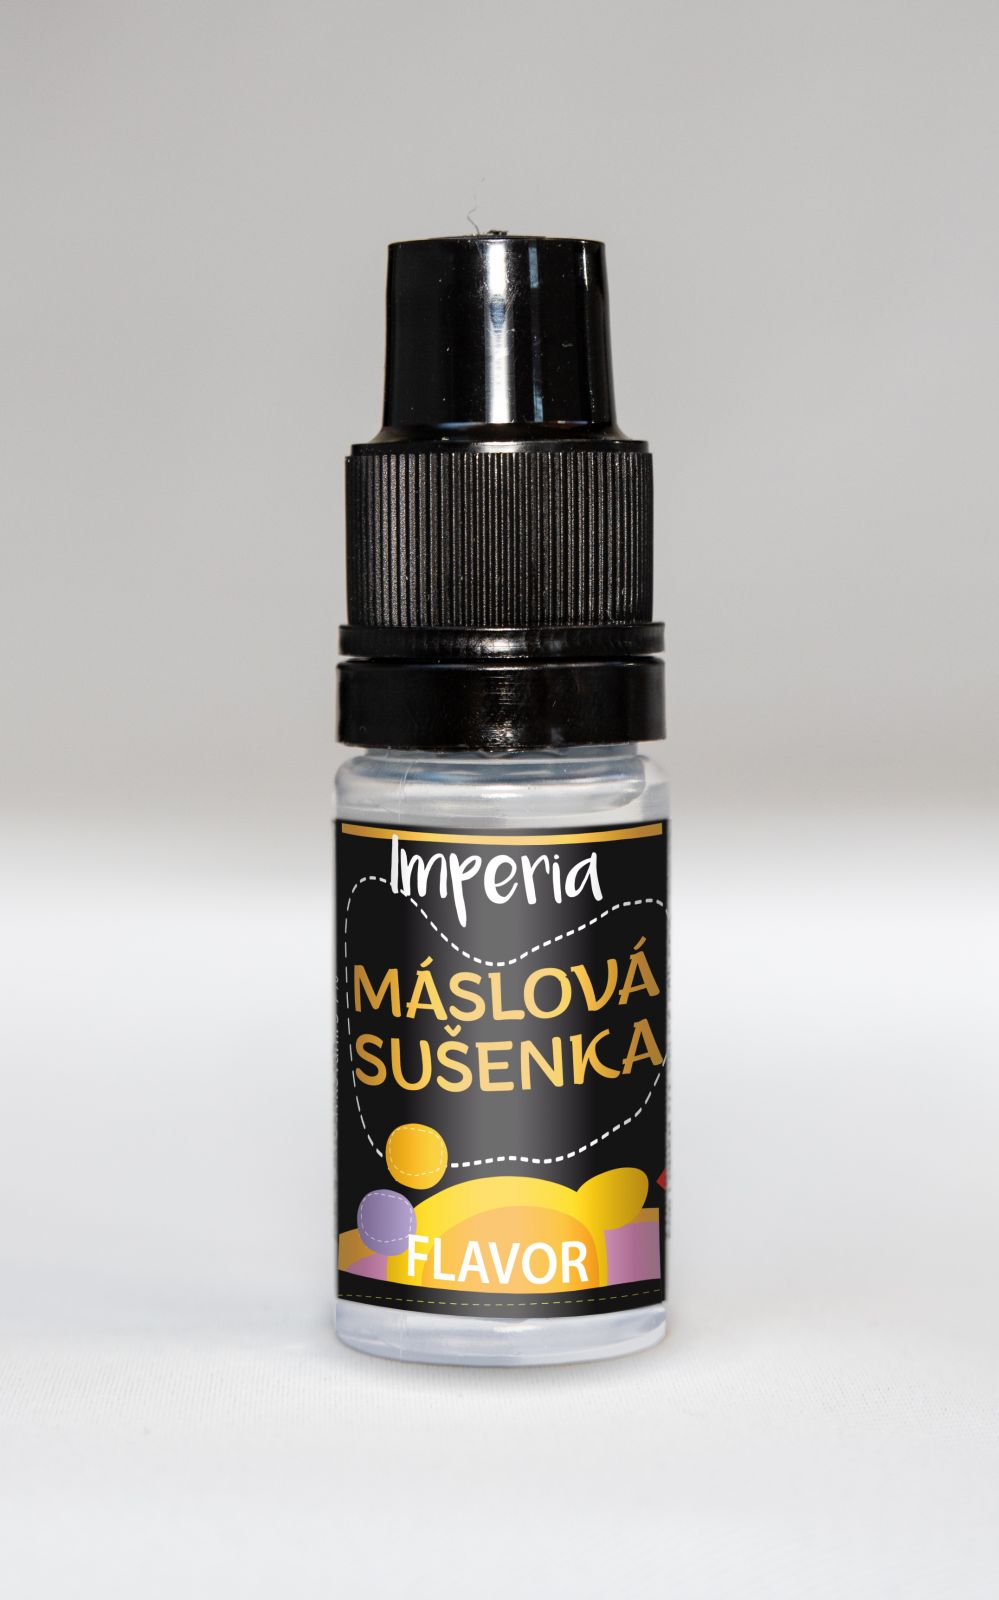 MASLOVÁ SUŠIENKA - Aróma Imperia Black Label Boudoir Samadhi s.r.o.